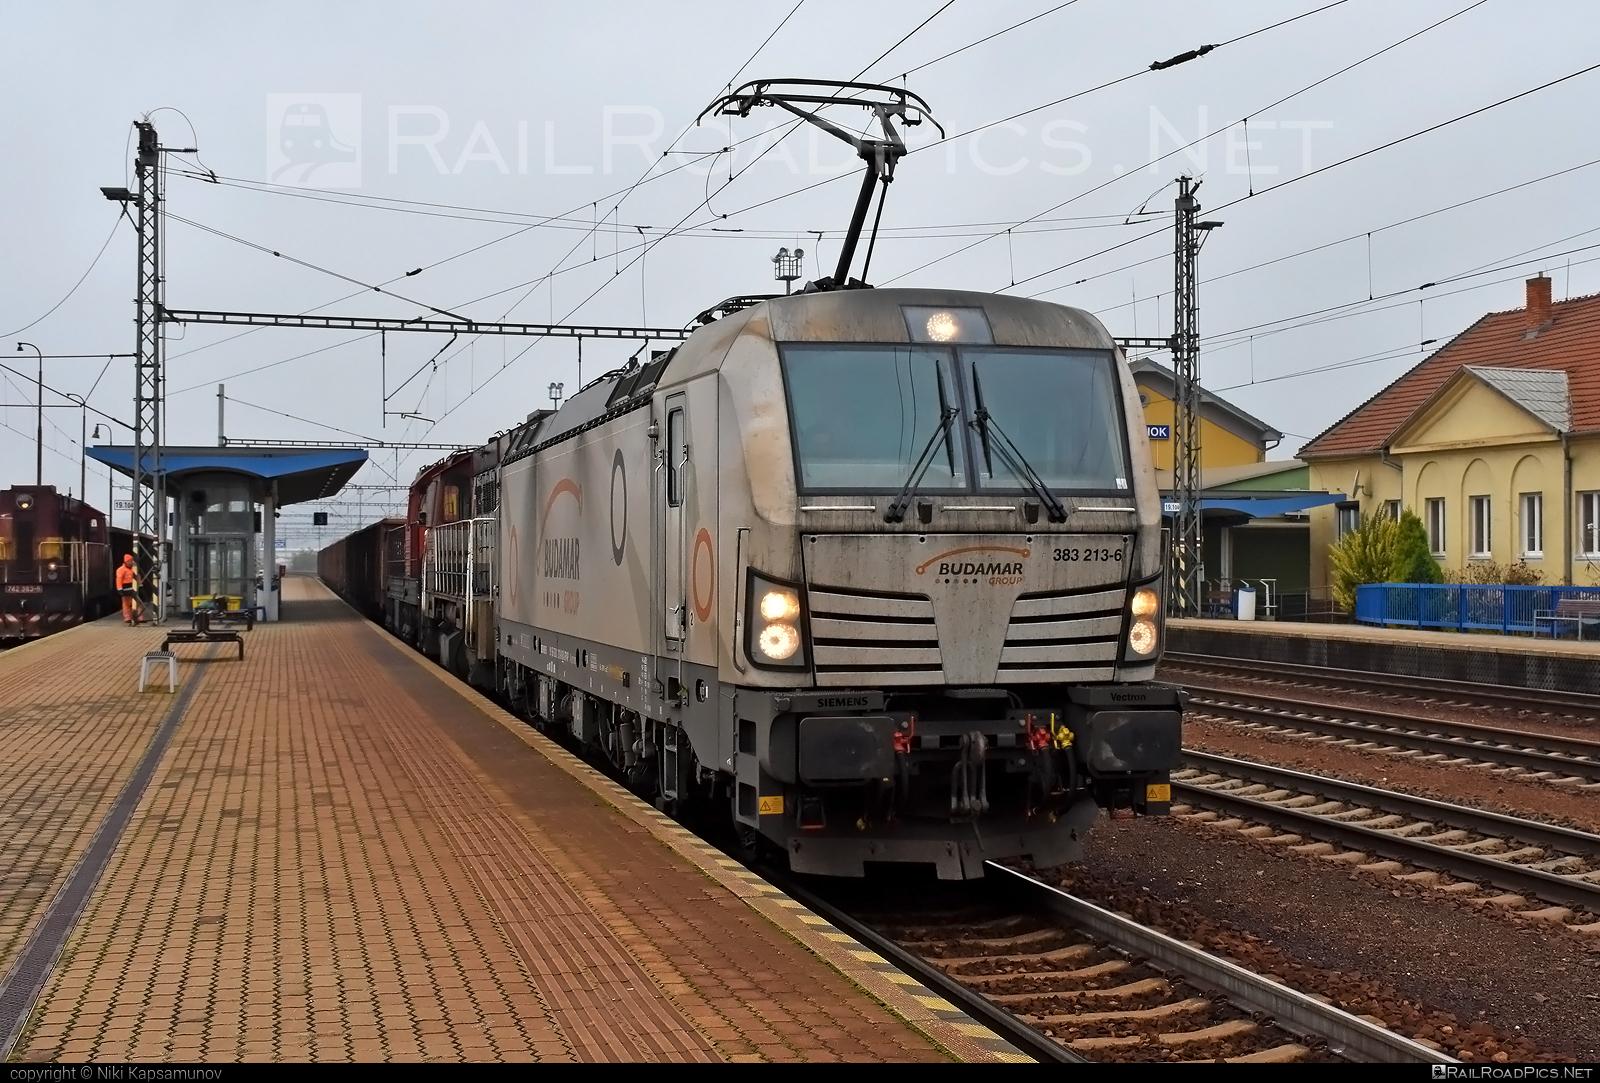 Siemens Vectron MS - 383 213-6 operated by LOKORAIL, a.s. #budamar #budamargroup #lokorail #lrl #siemens #siemensvectron #siemensvectronms #slovenskaplavbaapristavy #slovenskaplavbaapristavyas #spap #vectron #vectronms